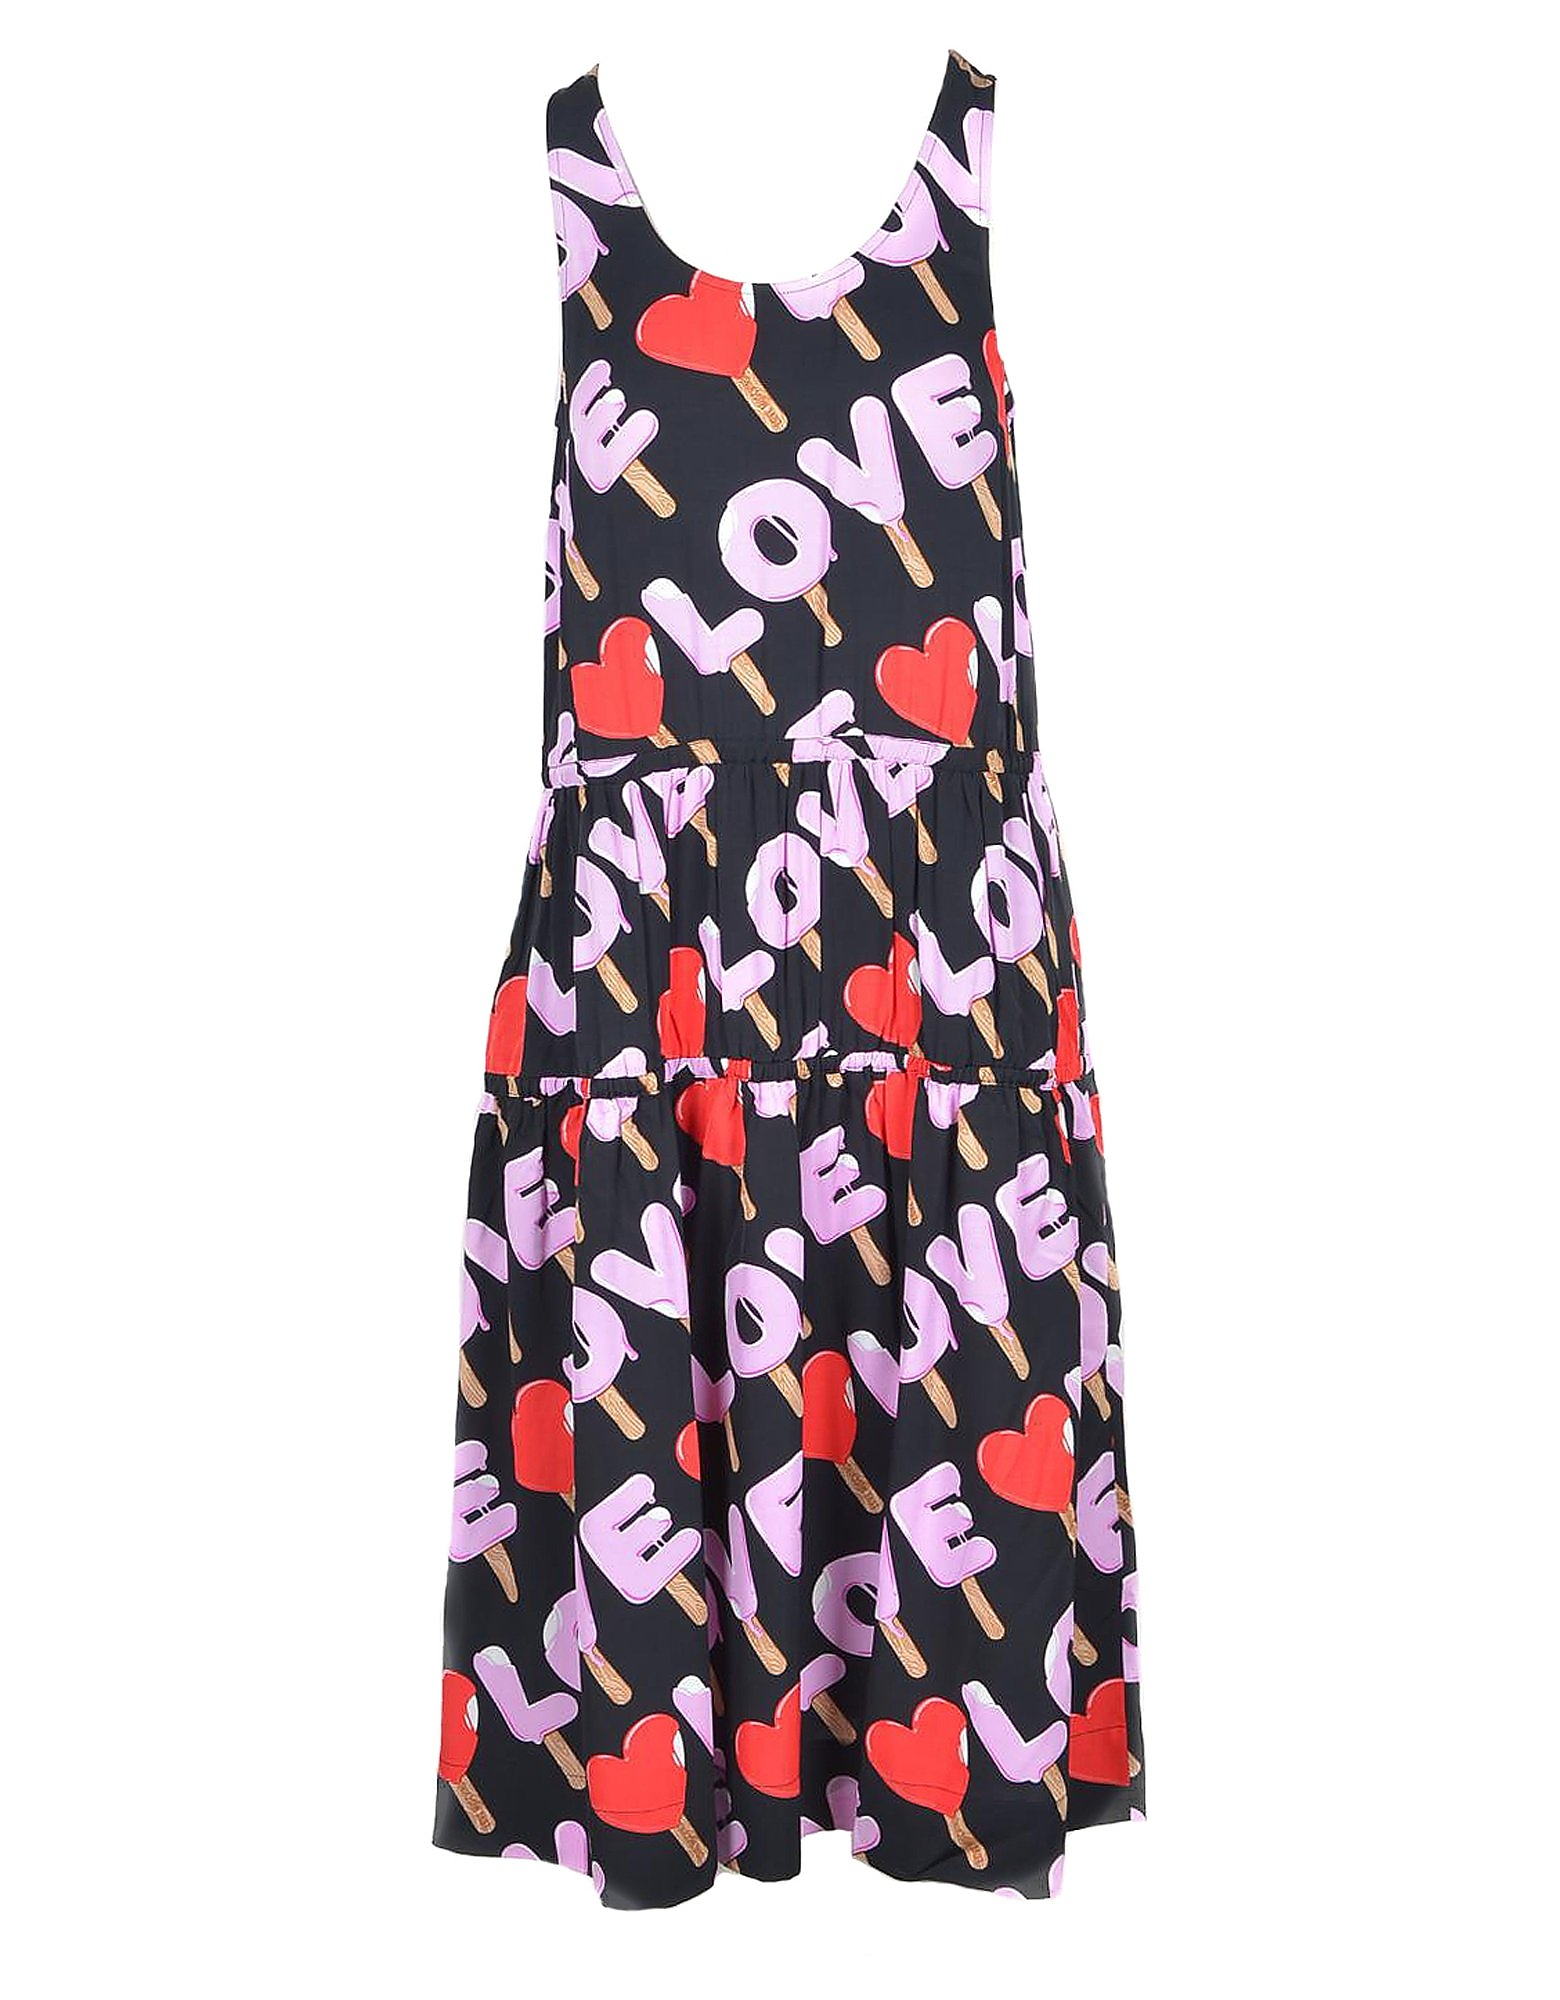 Love Moschino Designer Dresses & Jumpsuits, Women's Black / Pink Dress